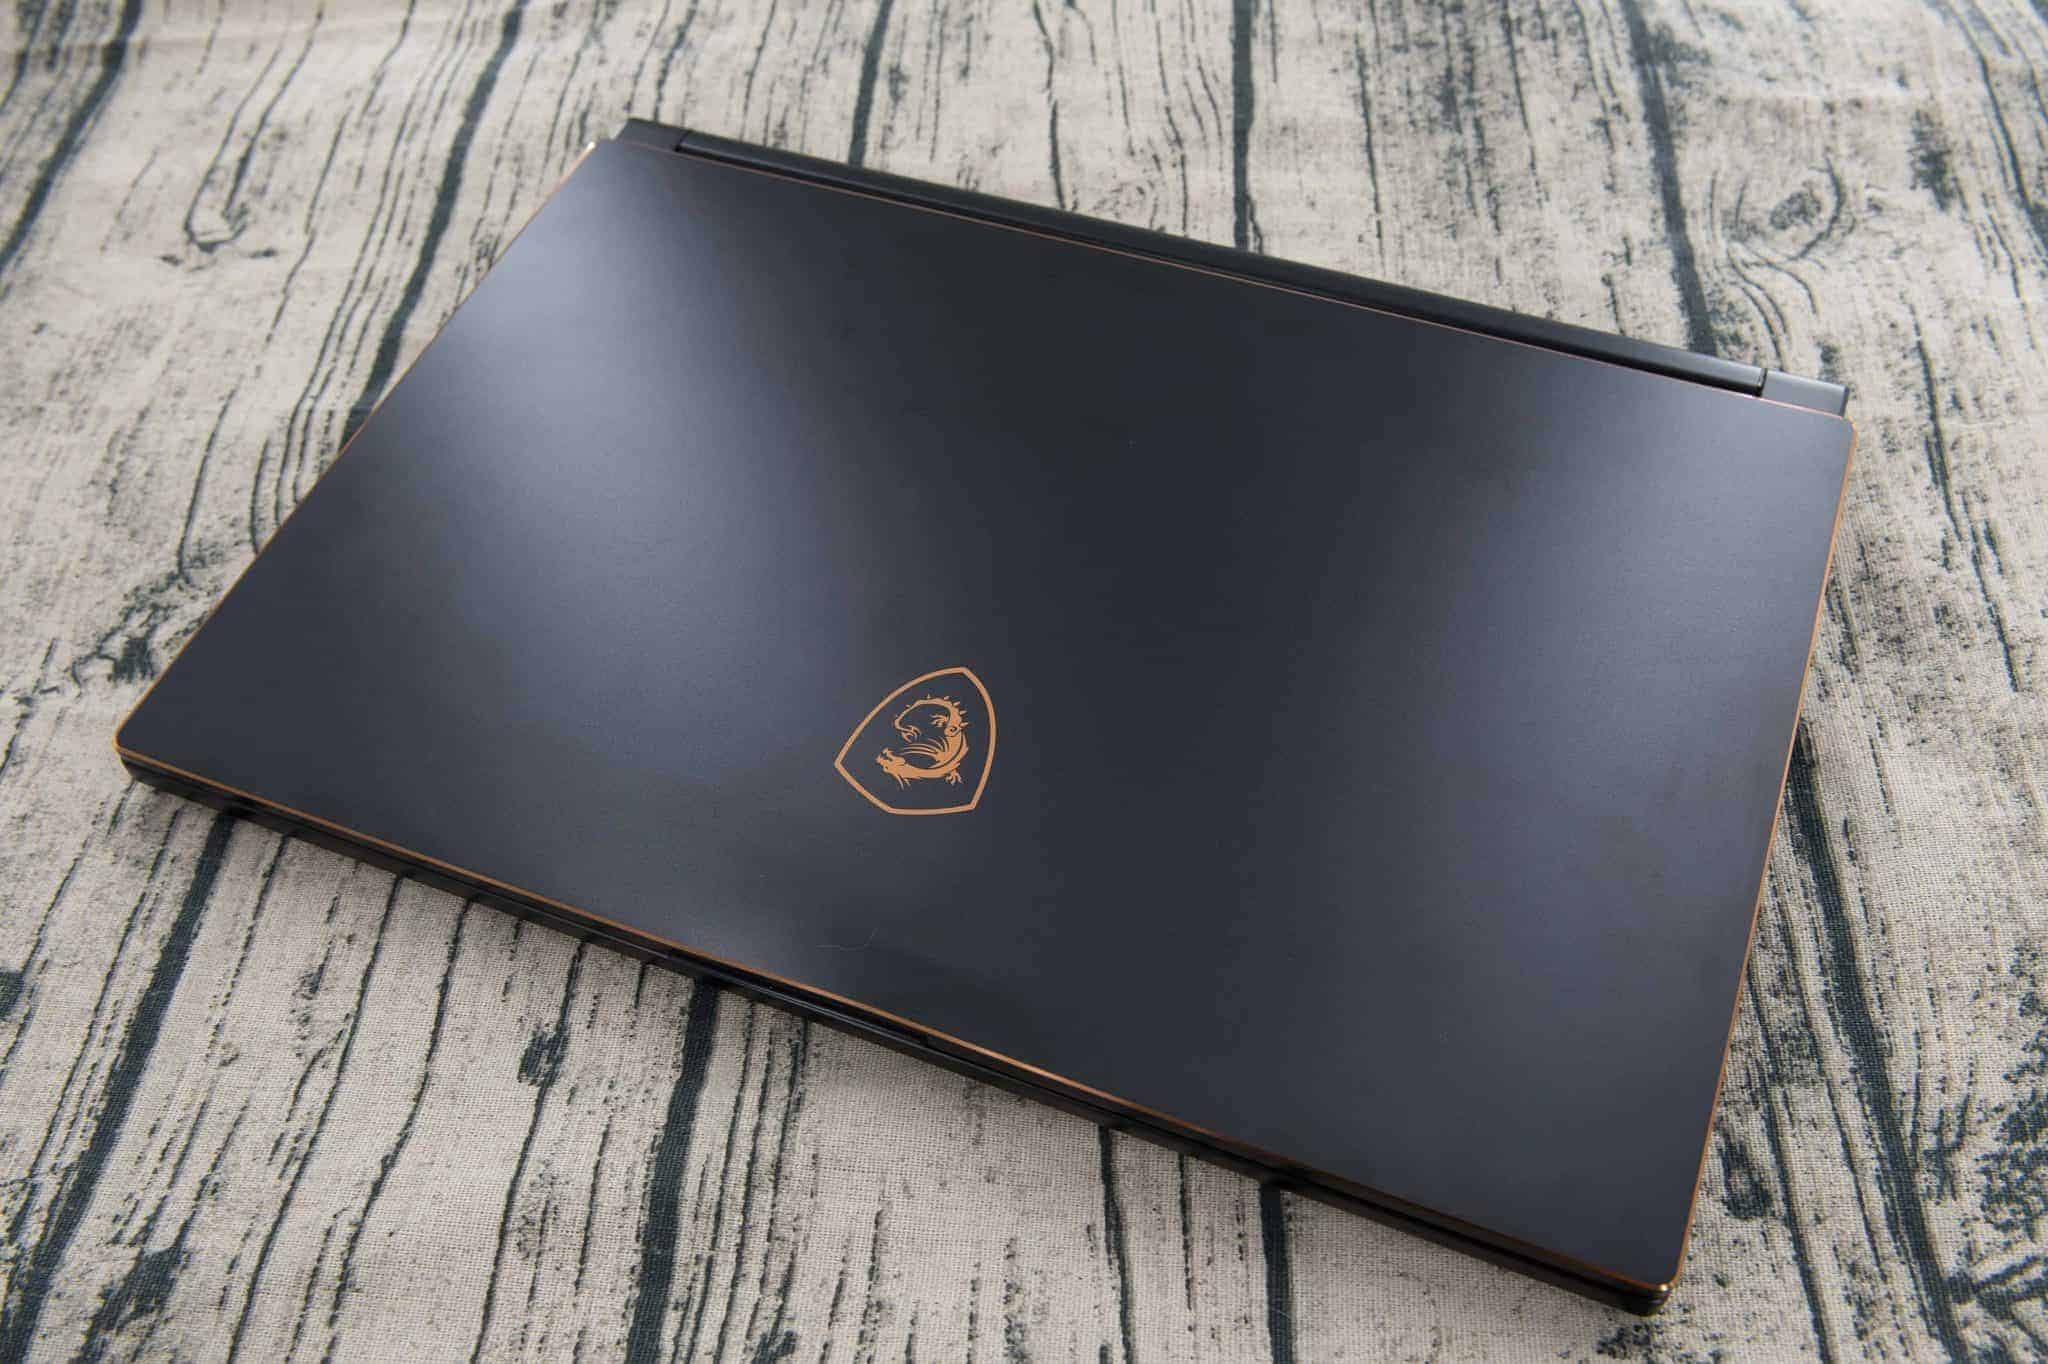 GS65 8RE Stealth Thin 開箱評測 – MSI最好的高效能輕薄筆電